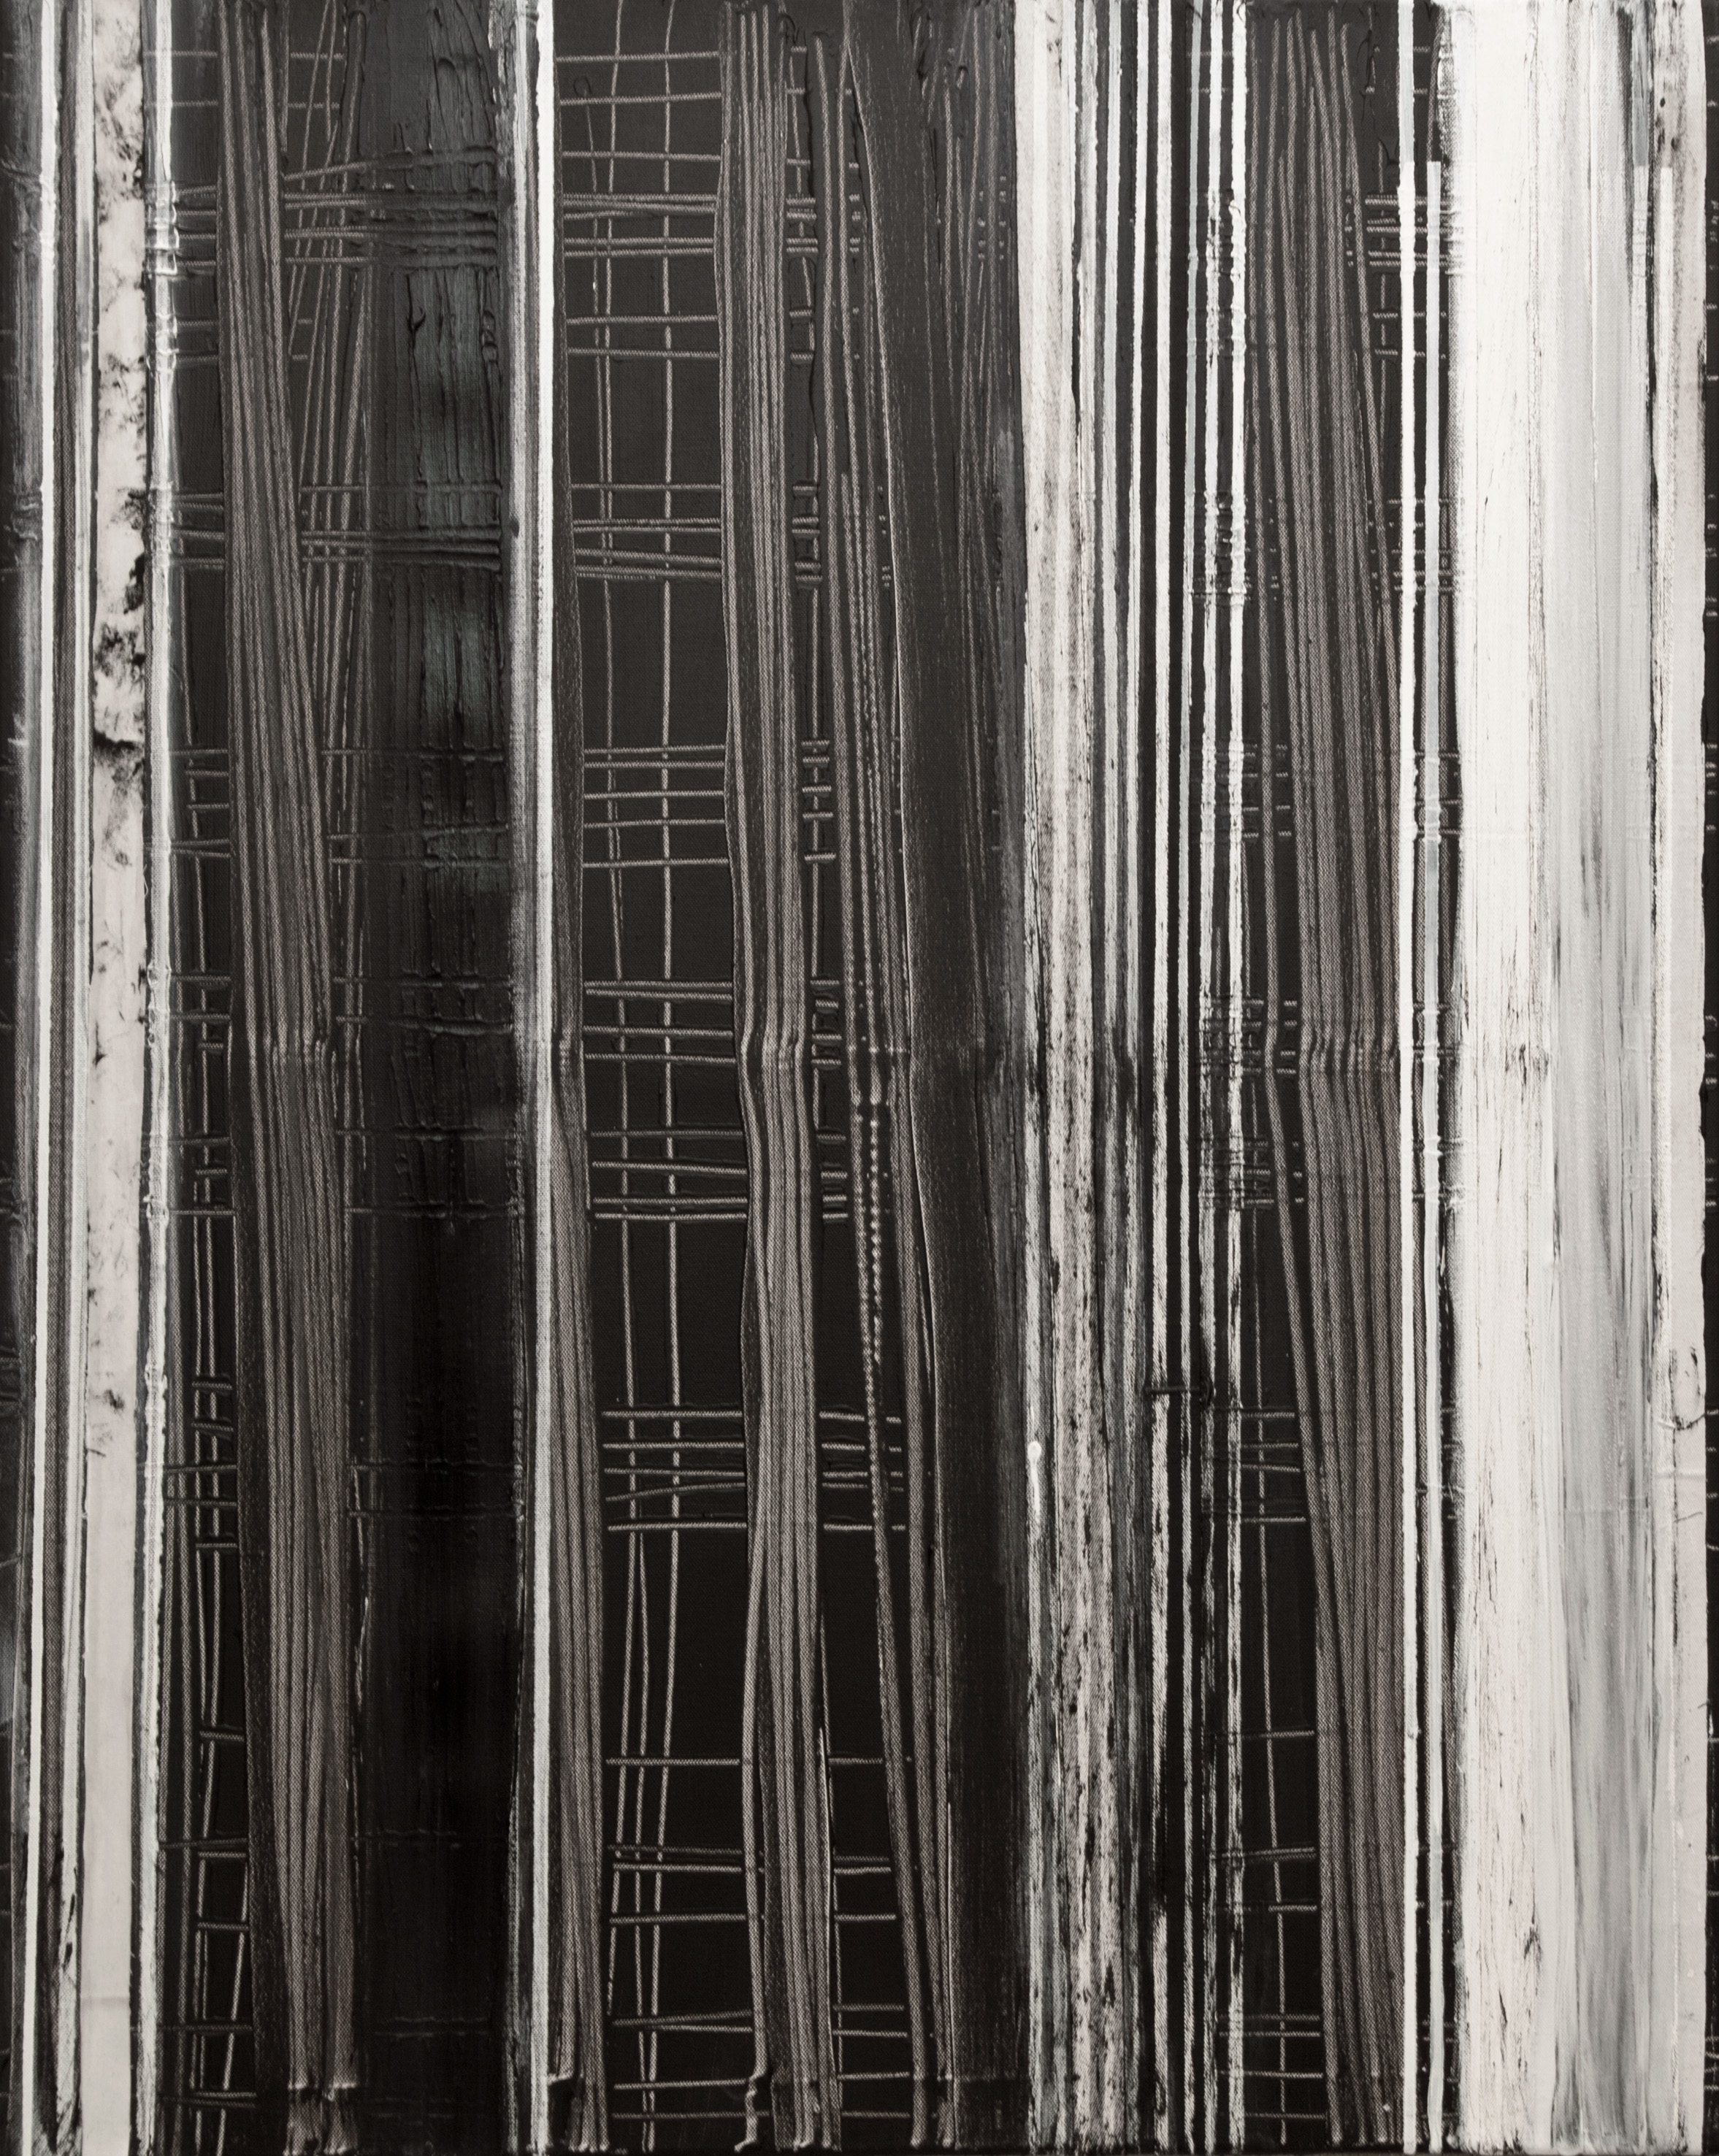 2 Herbert Egger –TRANSIT I-2012-80 x 100 cm-acrylic on canvas (2).jpg